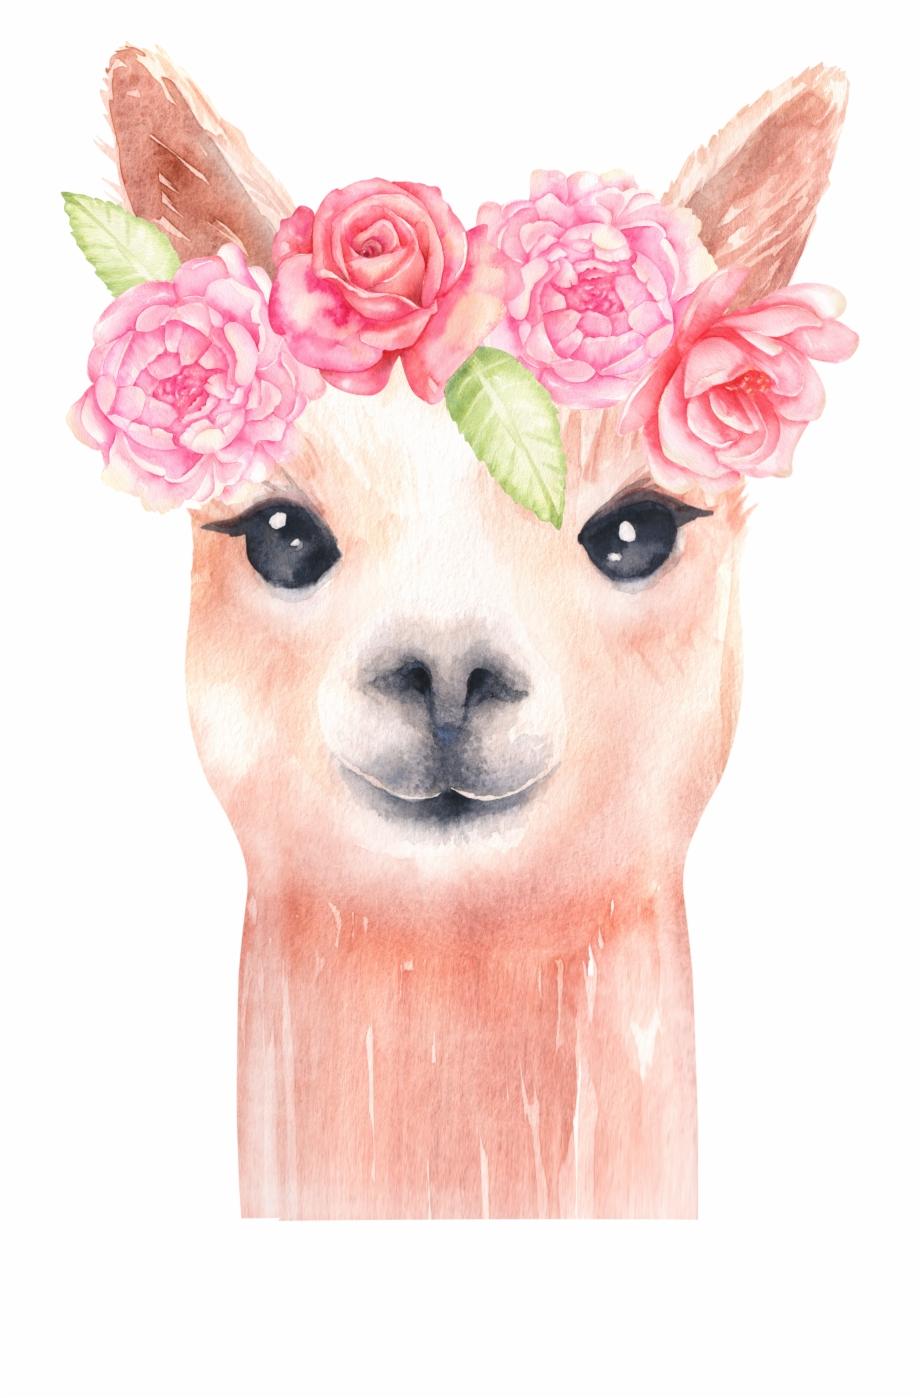 Llama clipart png vector royalty free stock Llama Graphics Alpaca And Flower Clip Art - Llama With Flower Crown ... vector royalty free stock